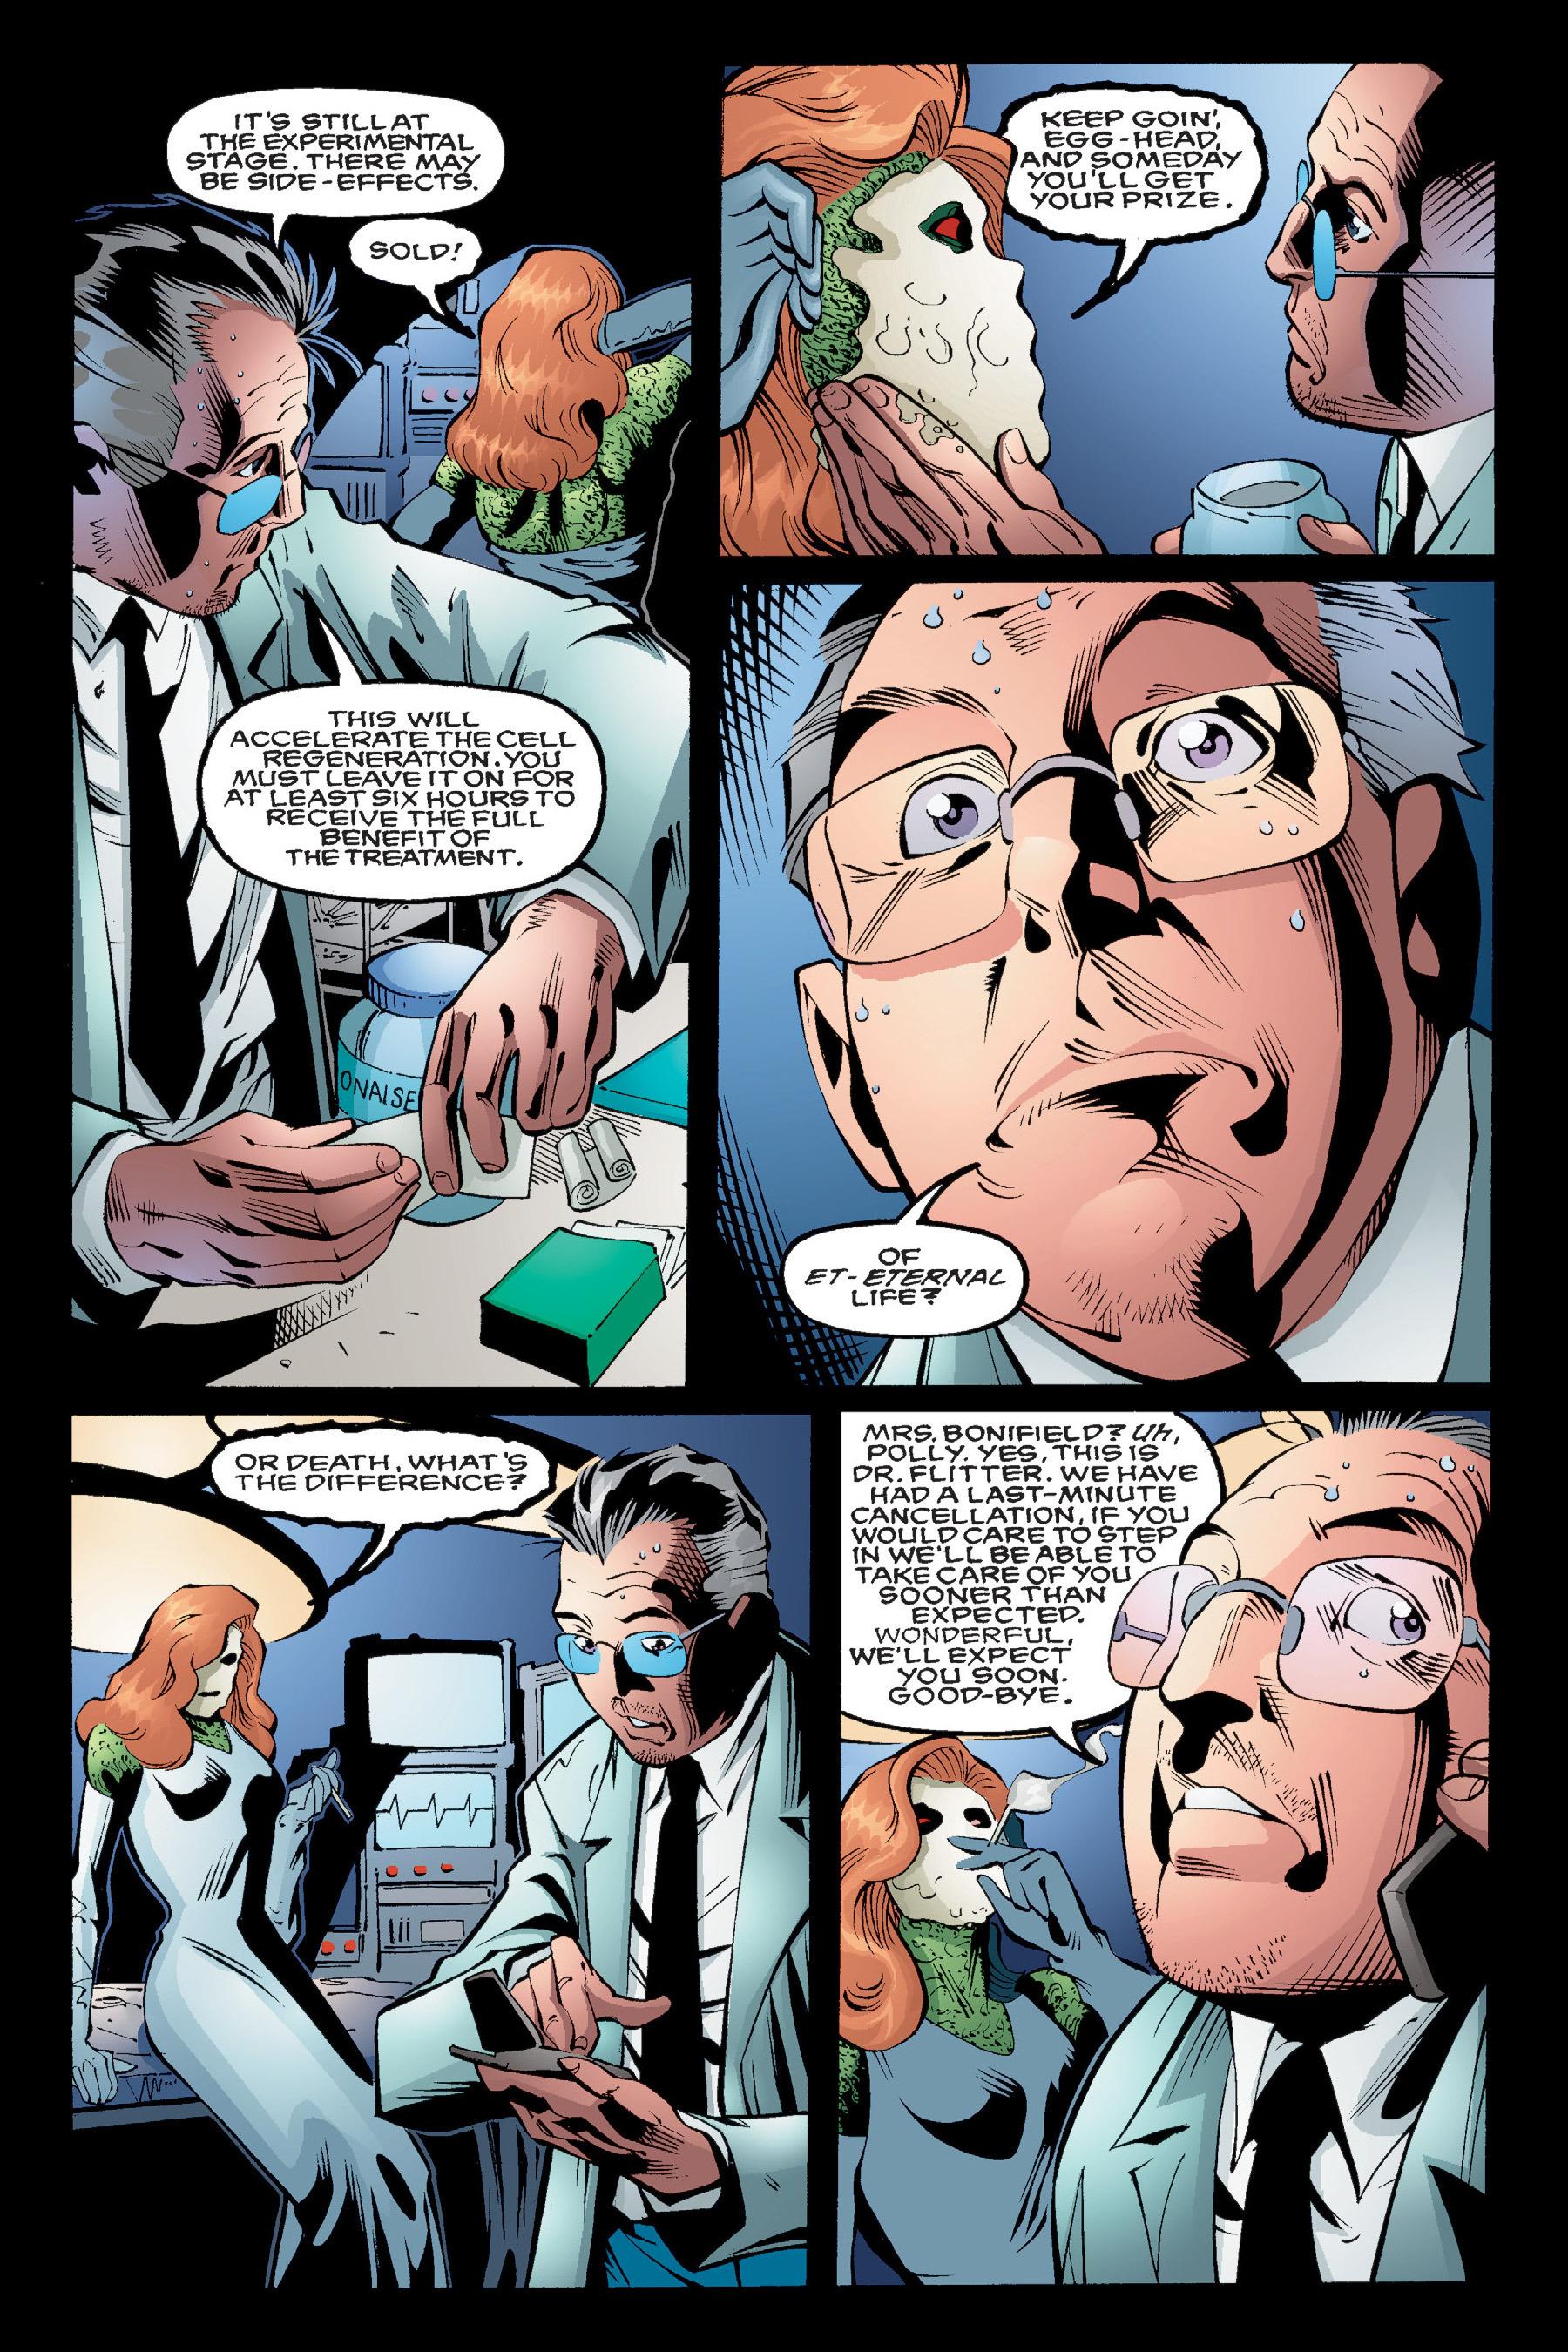 Read online Buffy the Vampire Slayer: Omnibus comic -  Issue # TPB 4 - 29